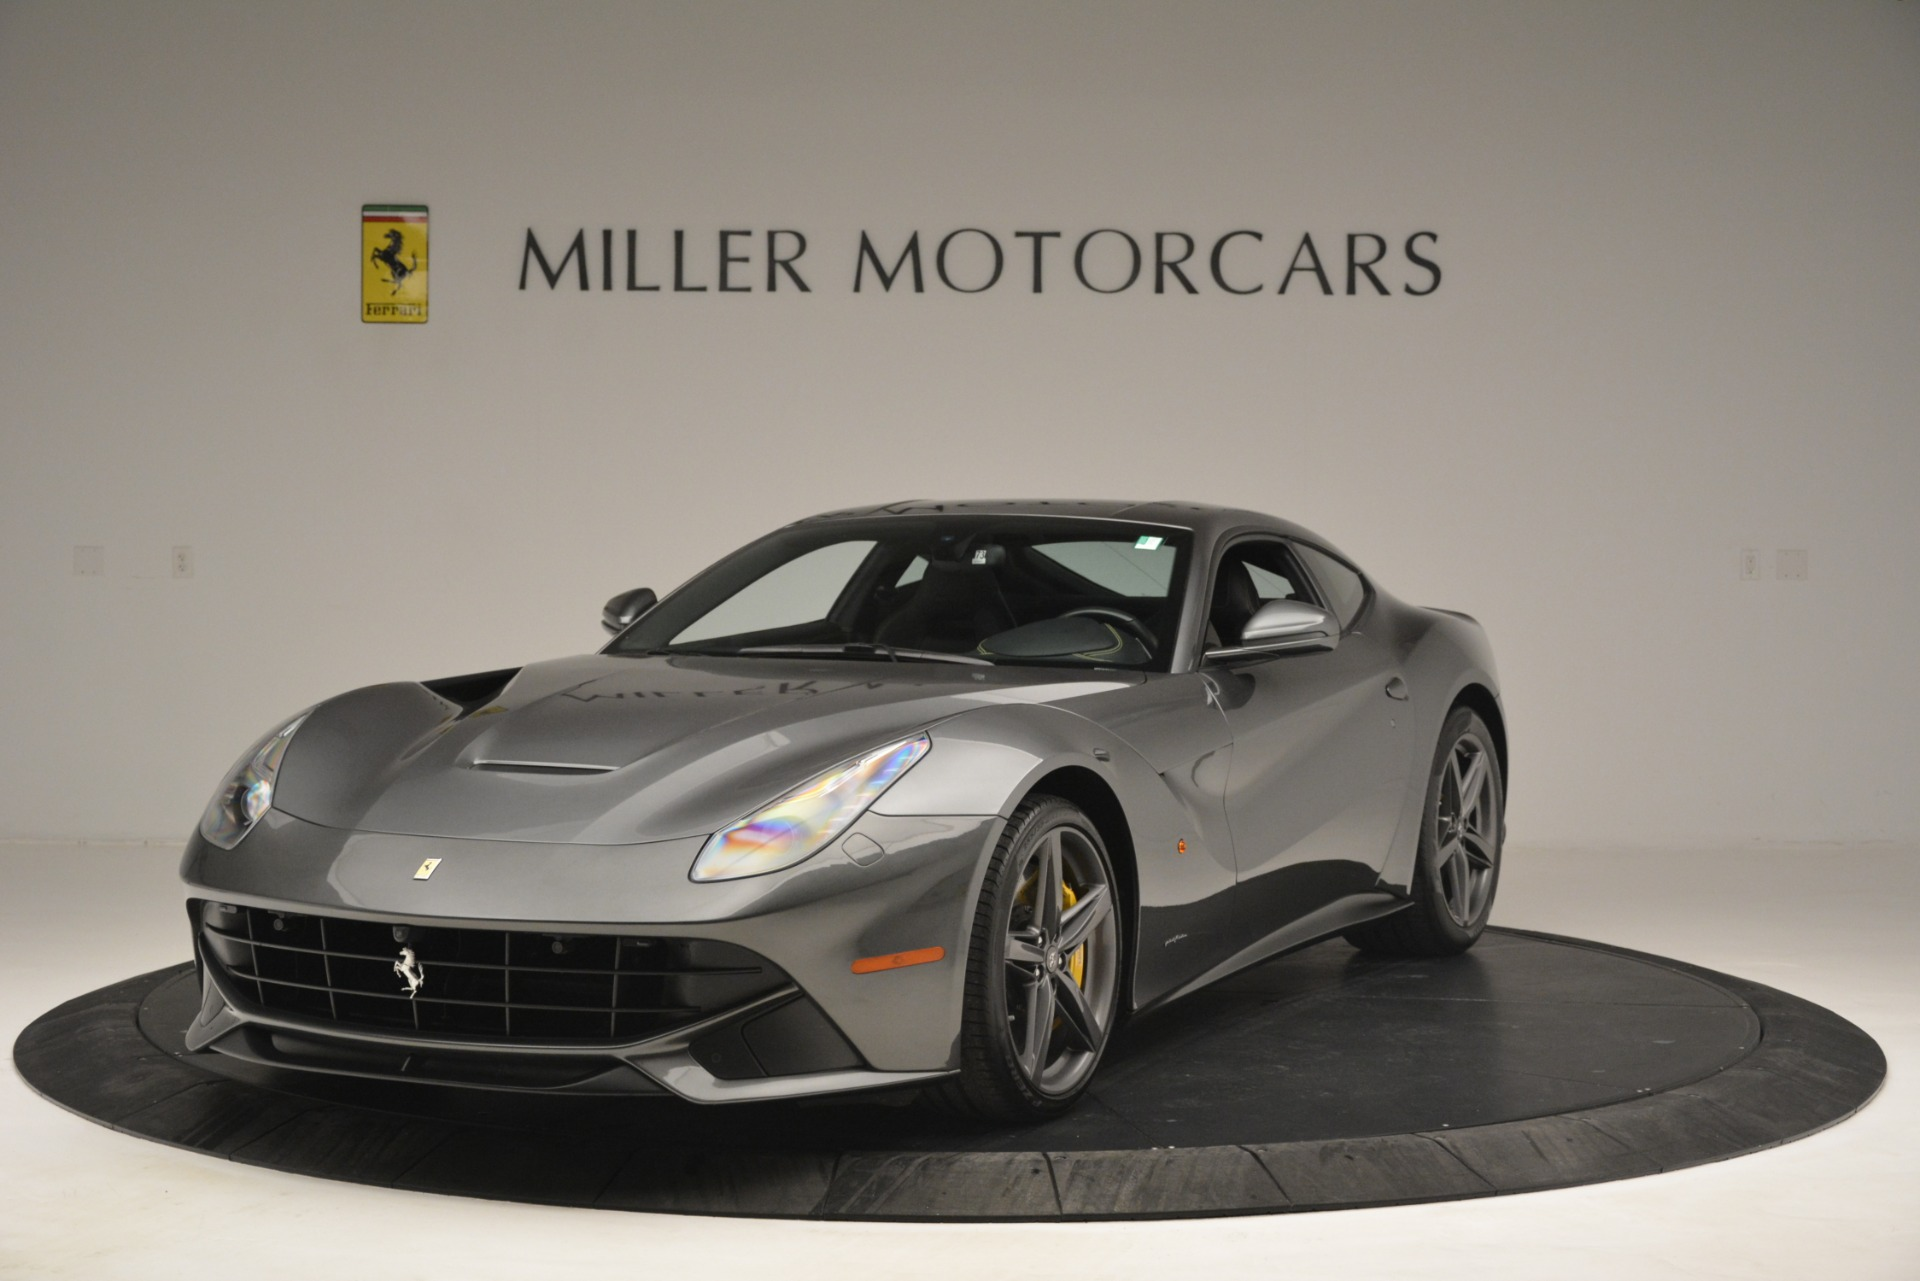 Used 2016 Ferrari F12 Berlinetta for sale Sold at Rolls-Royce Motor Cars Greenwich in Greenwich CT 06830 1